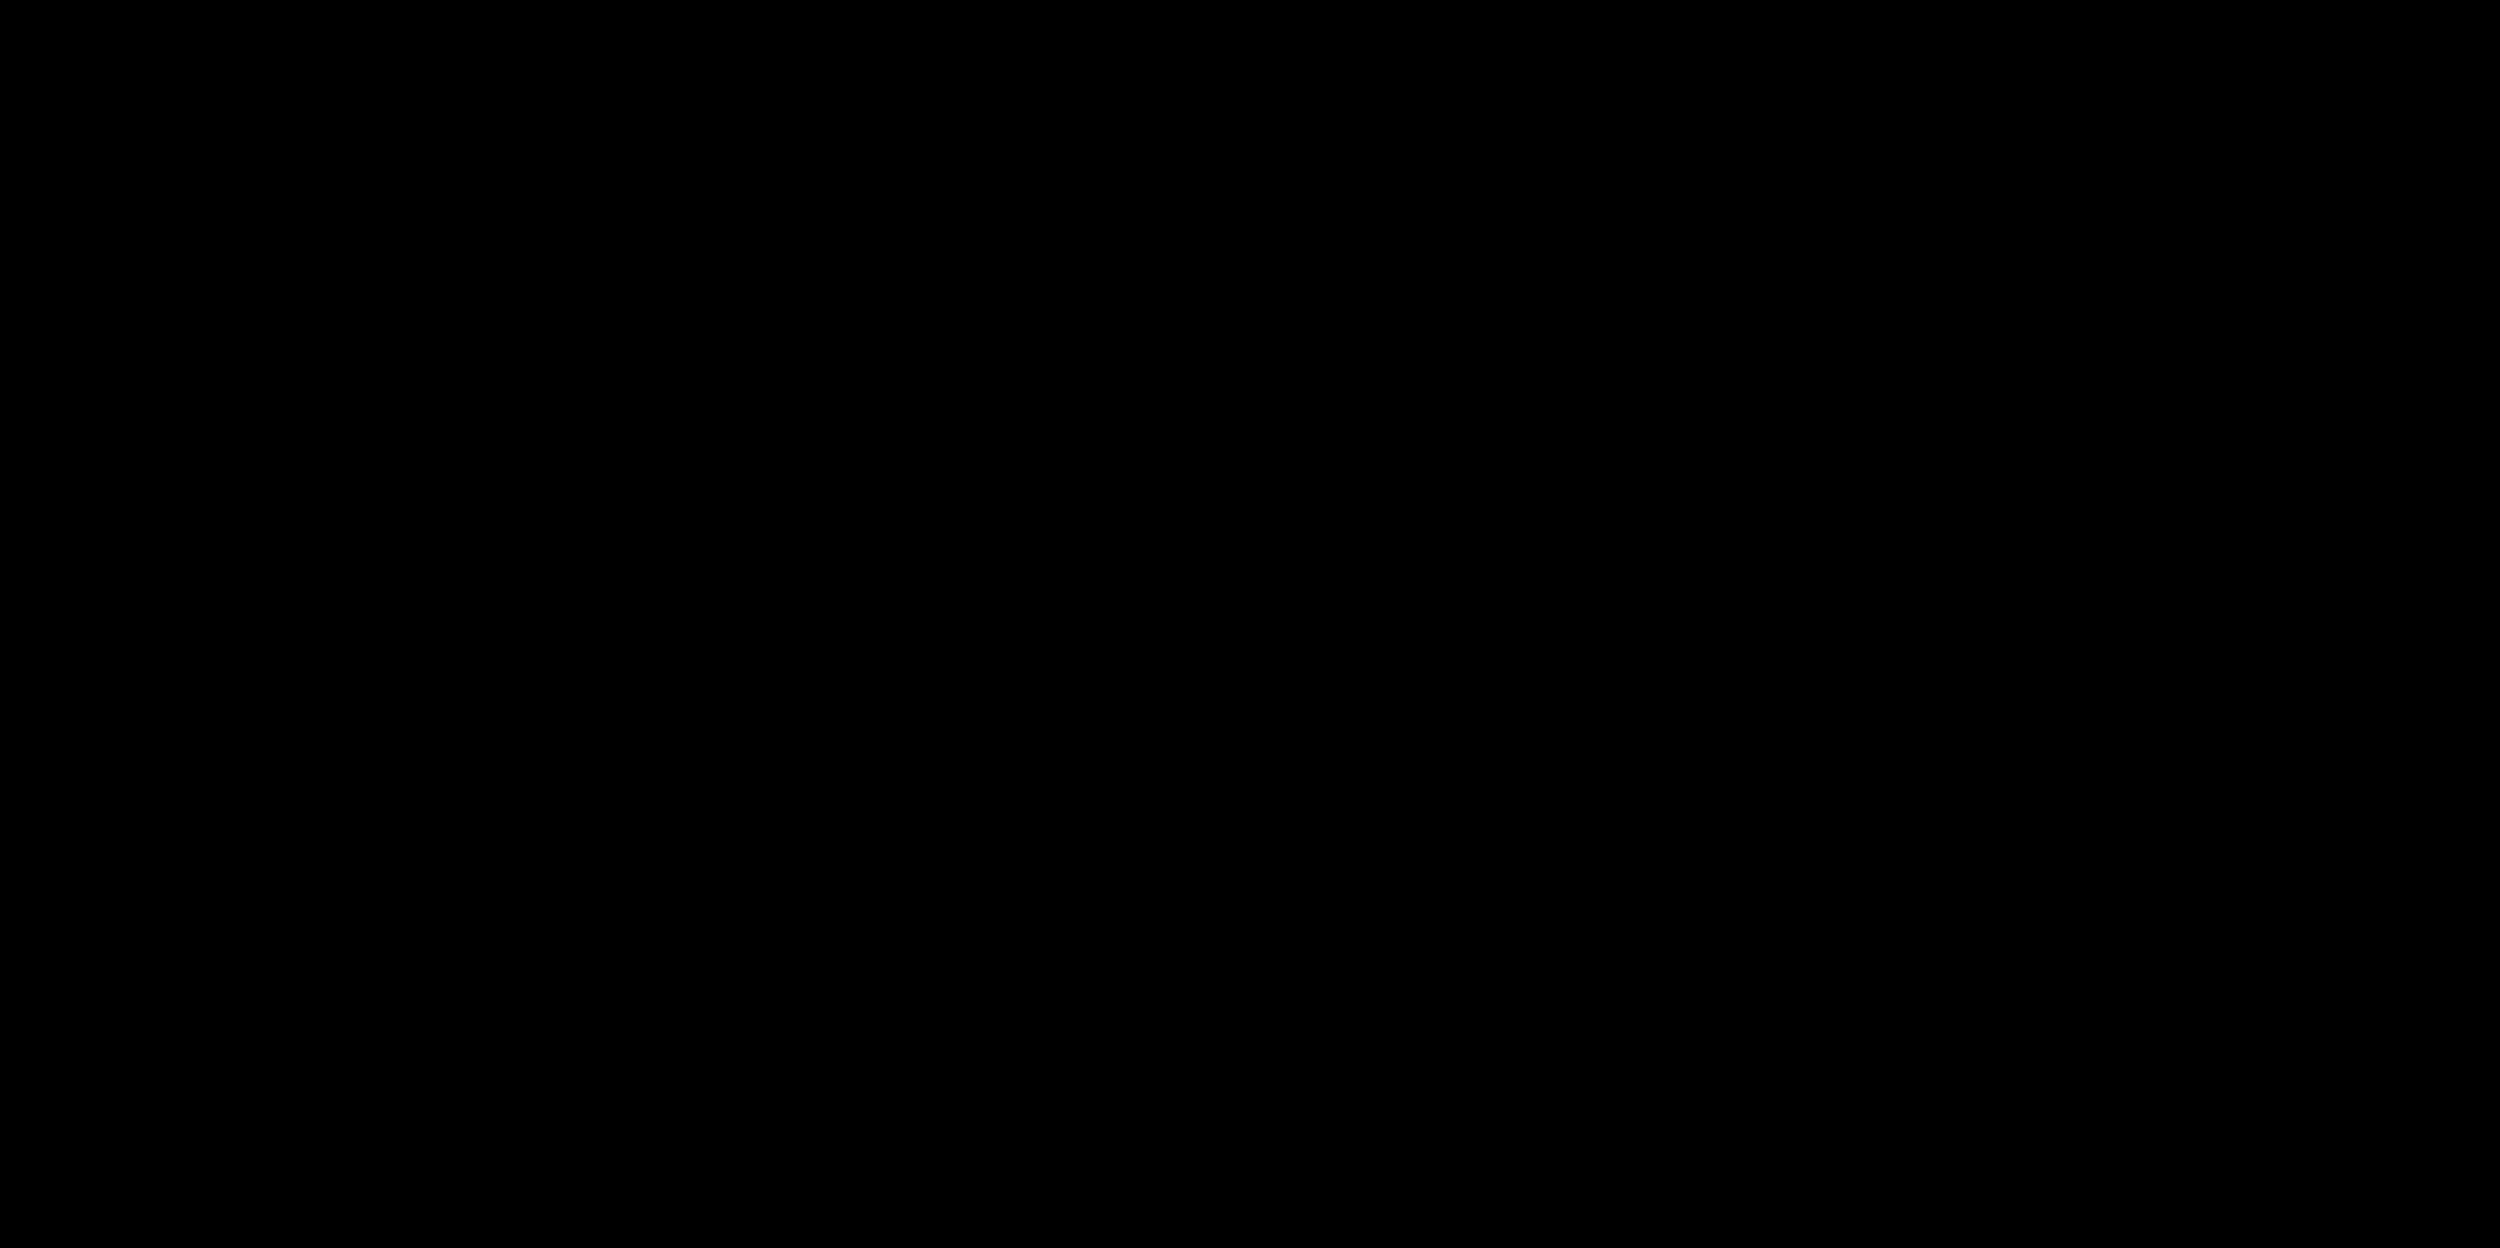 PolyFilmsBlack4.png